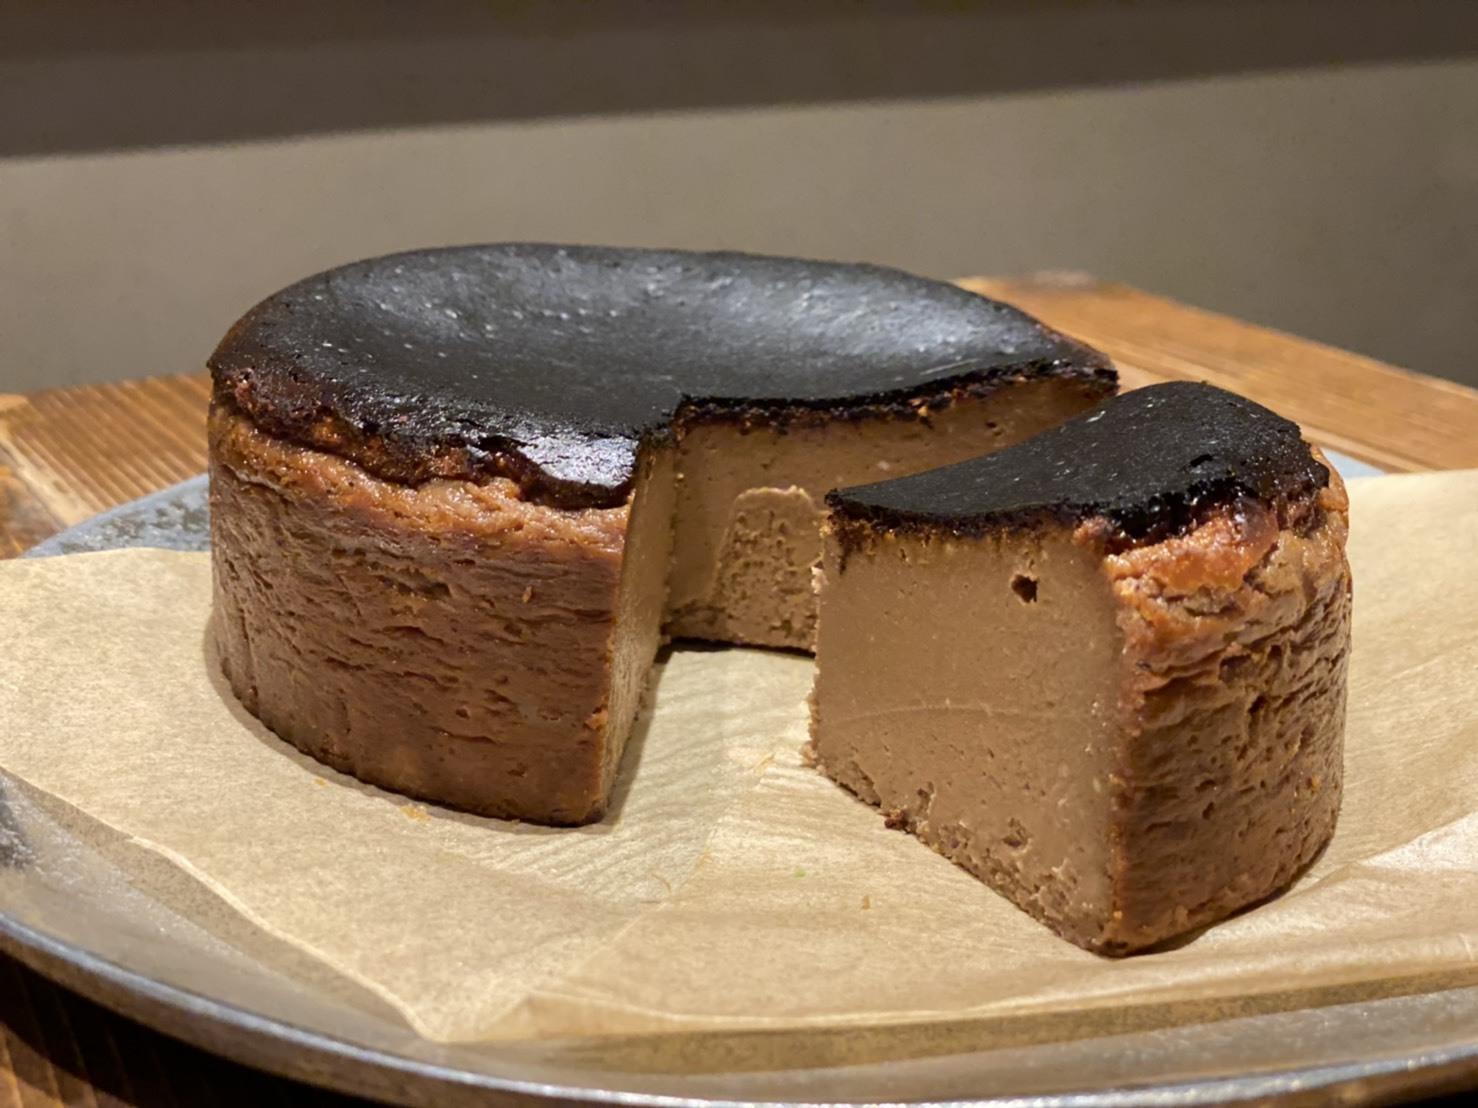 Mini basque(Chocolat)『ミニバスク(チョコレート)』